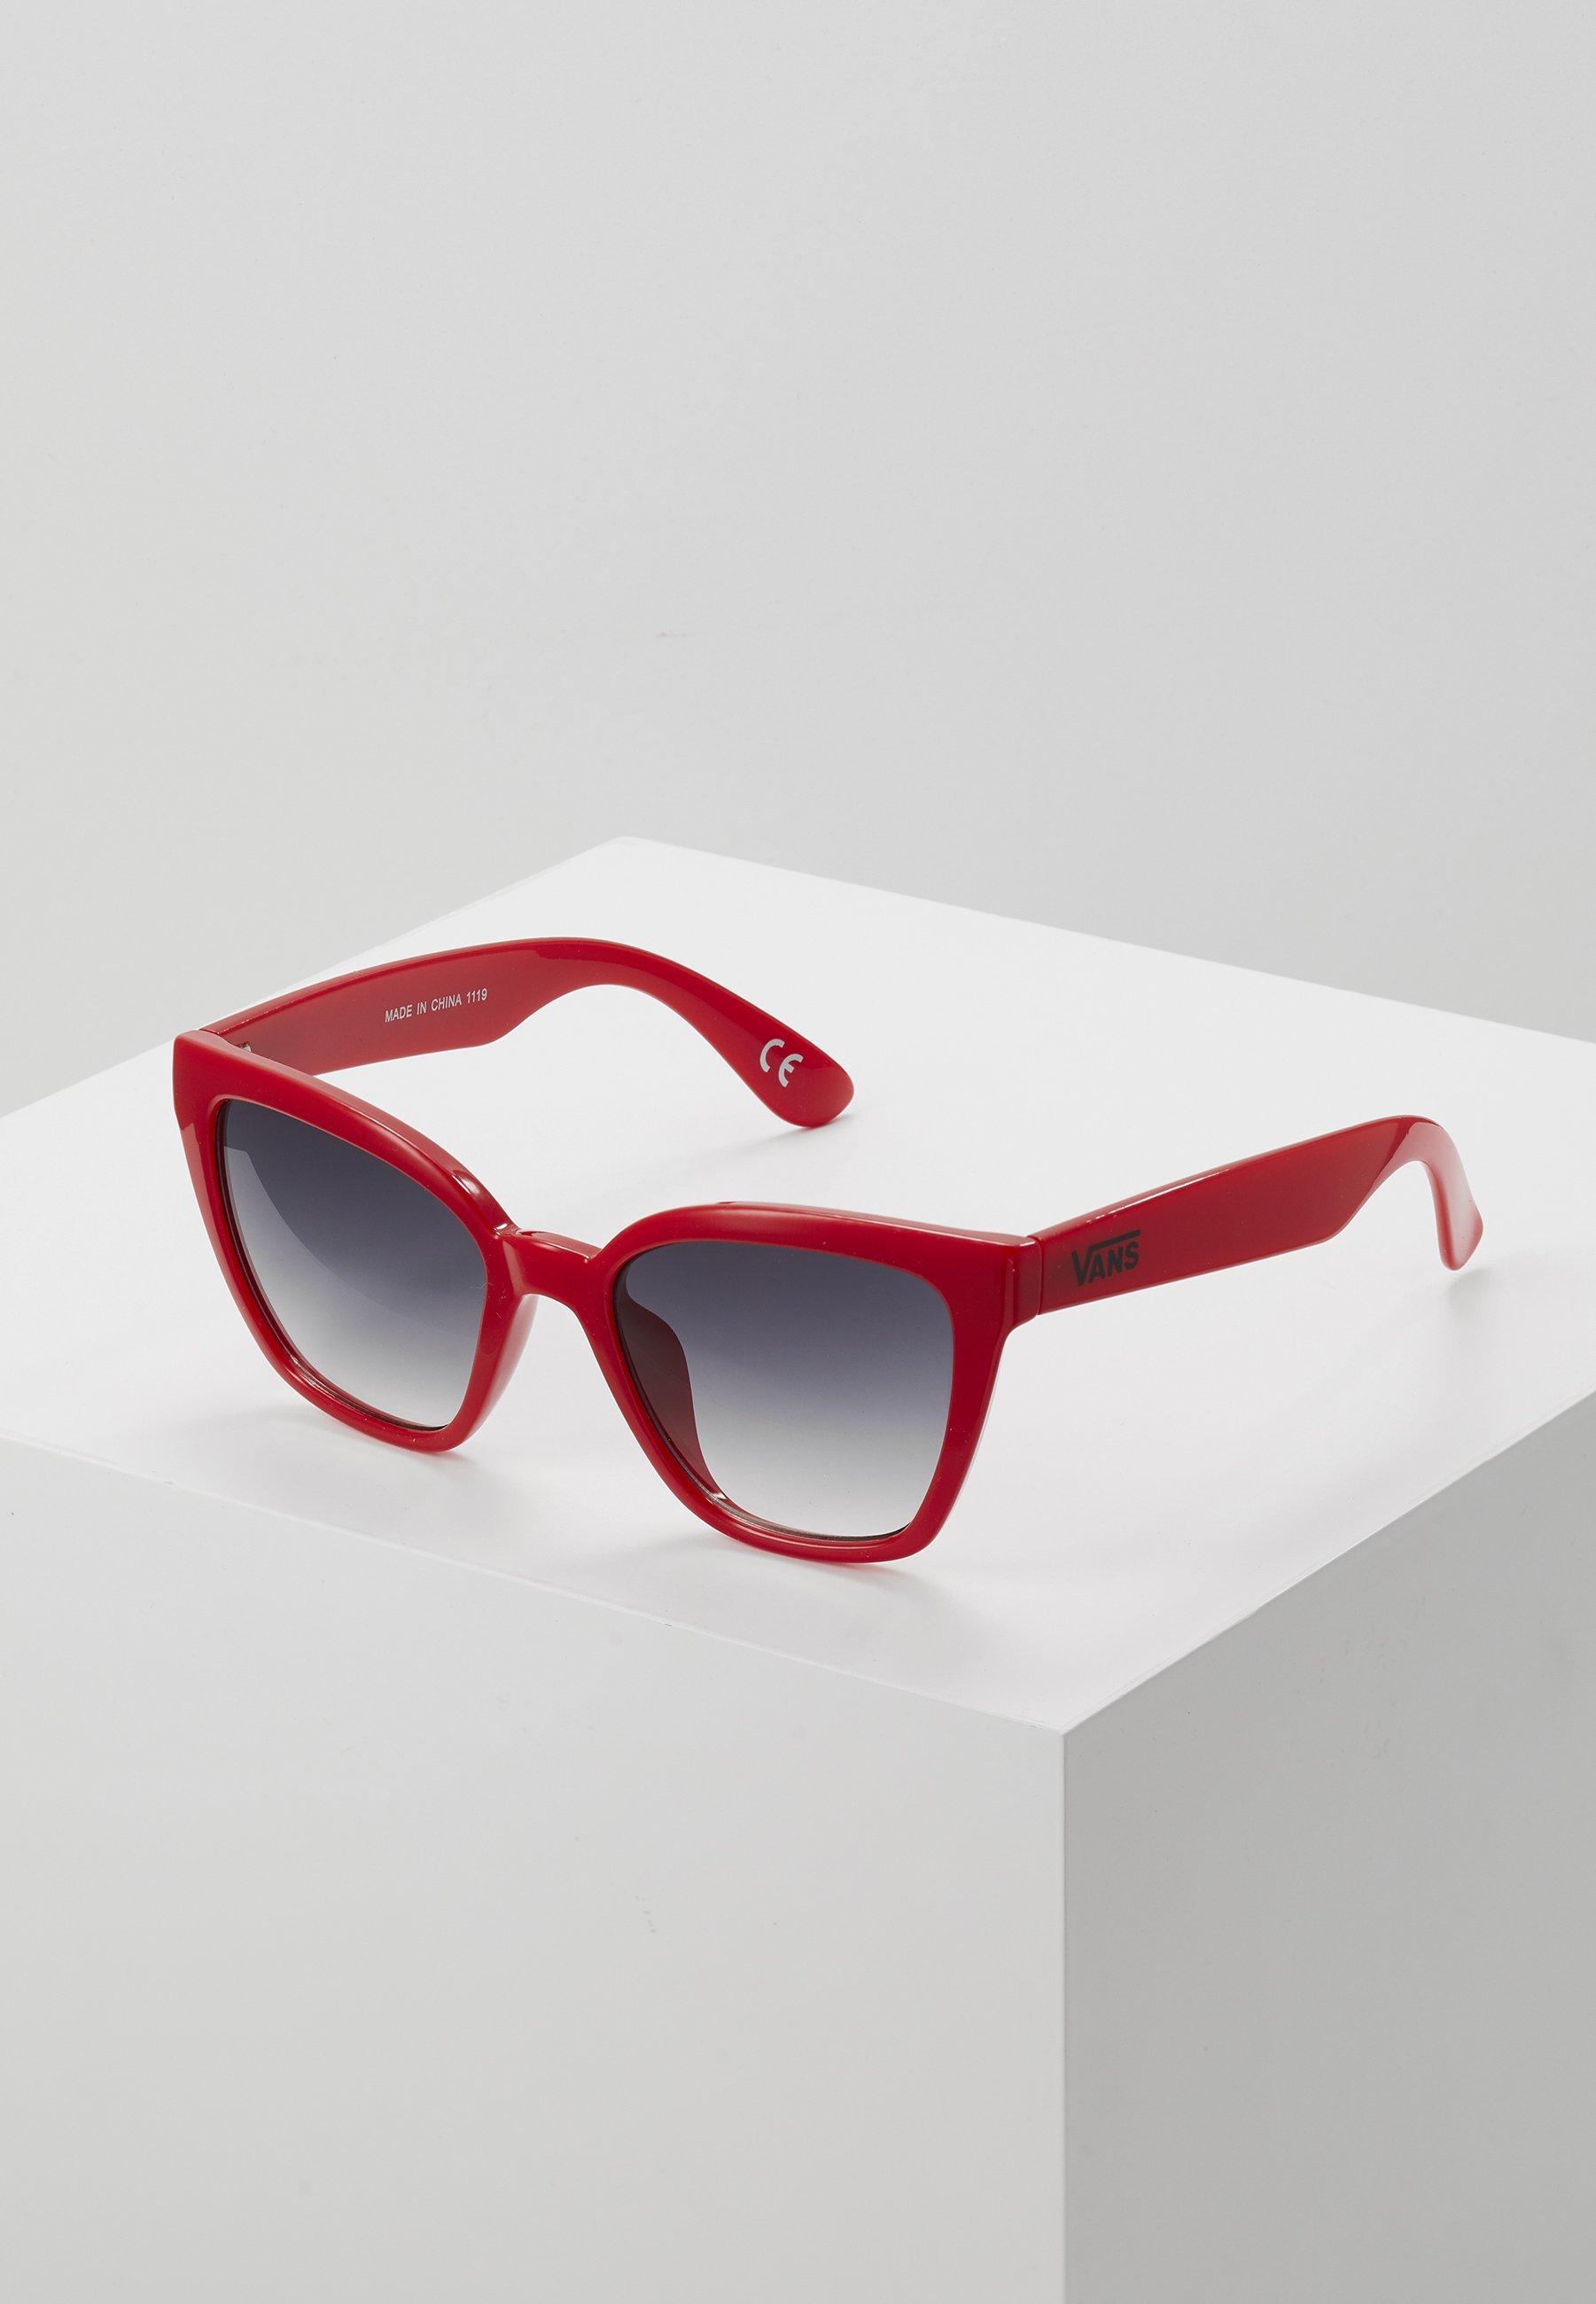 Vans HIP CAT SUNGLASSES - Sunglasses - goji berry